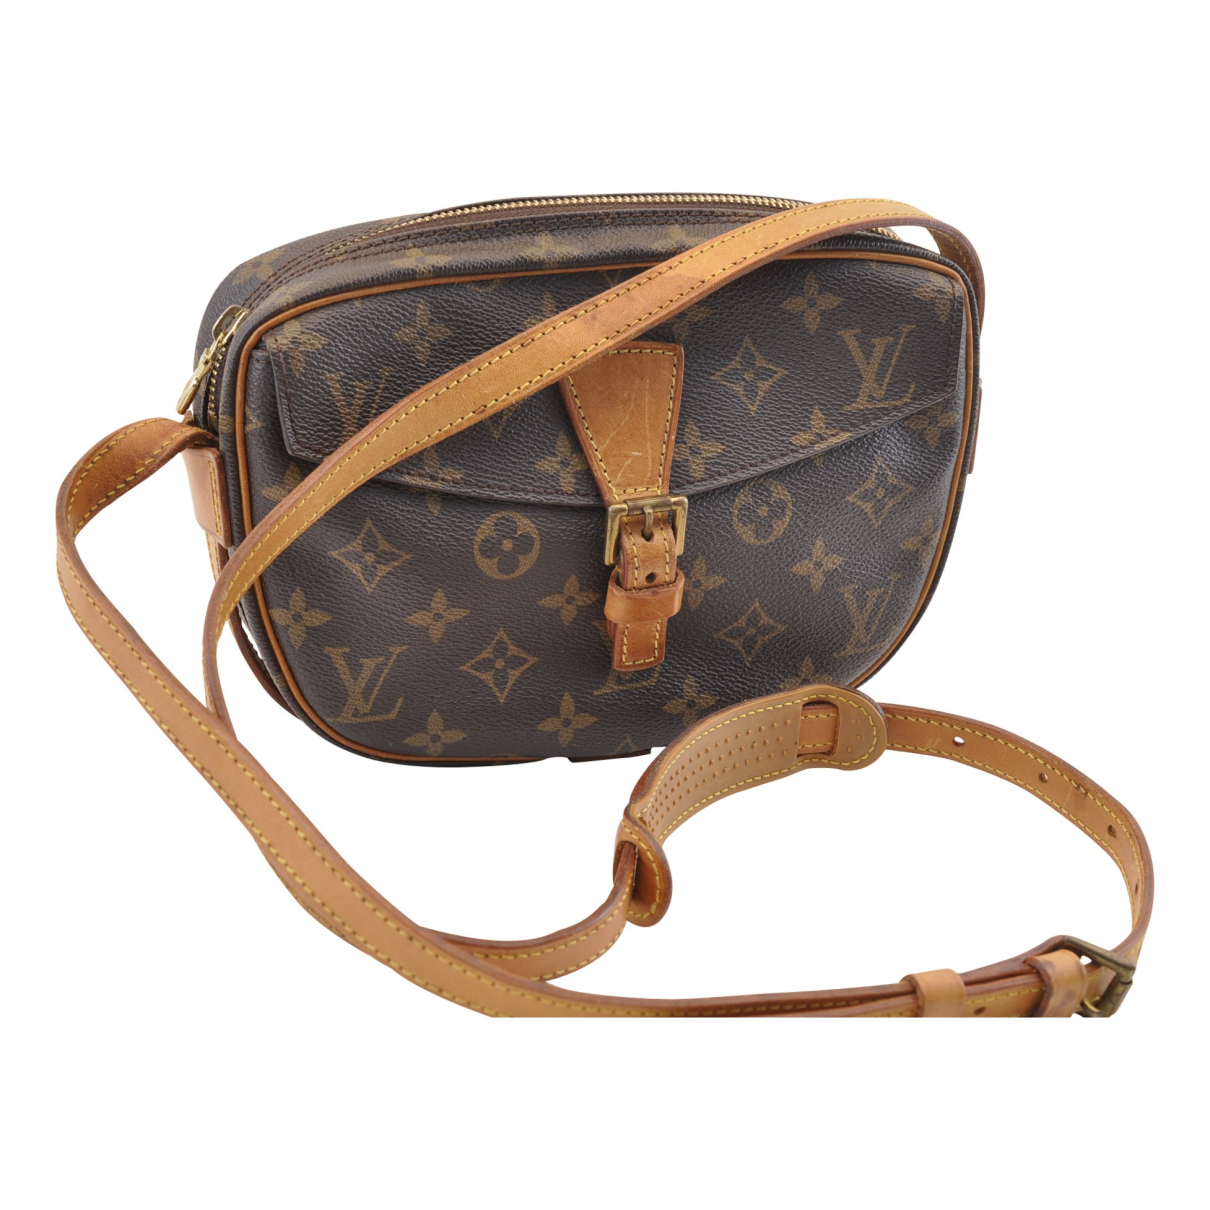 Bolso  Jeune fille  de Lona Louis Vuitton